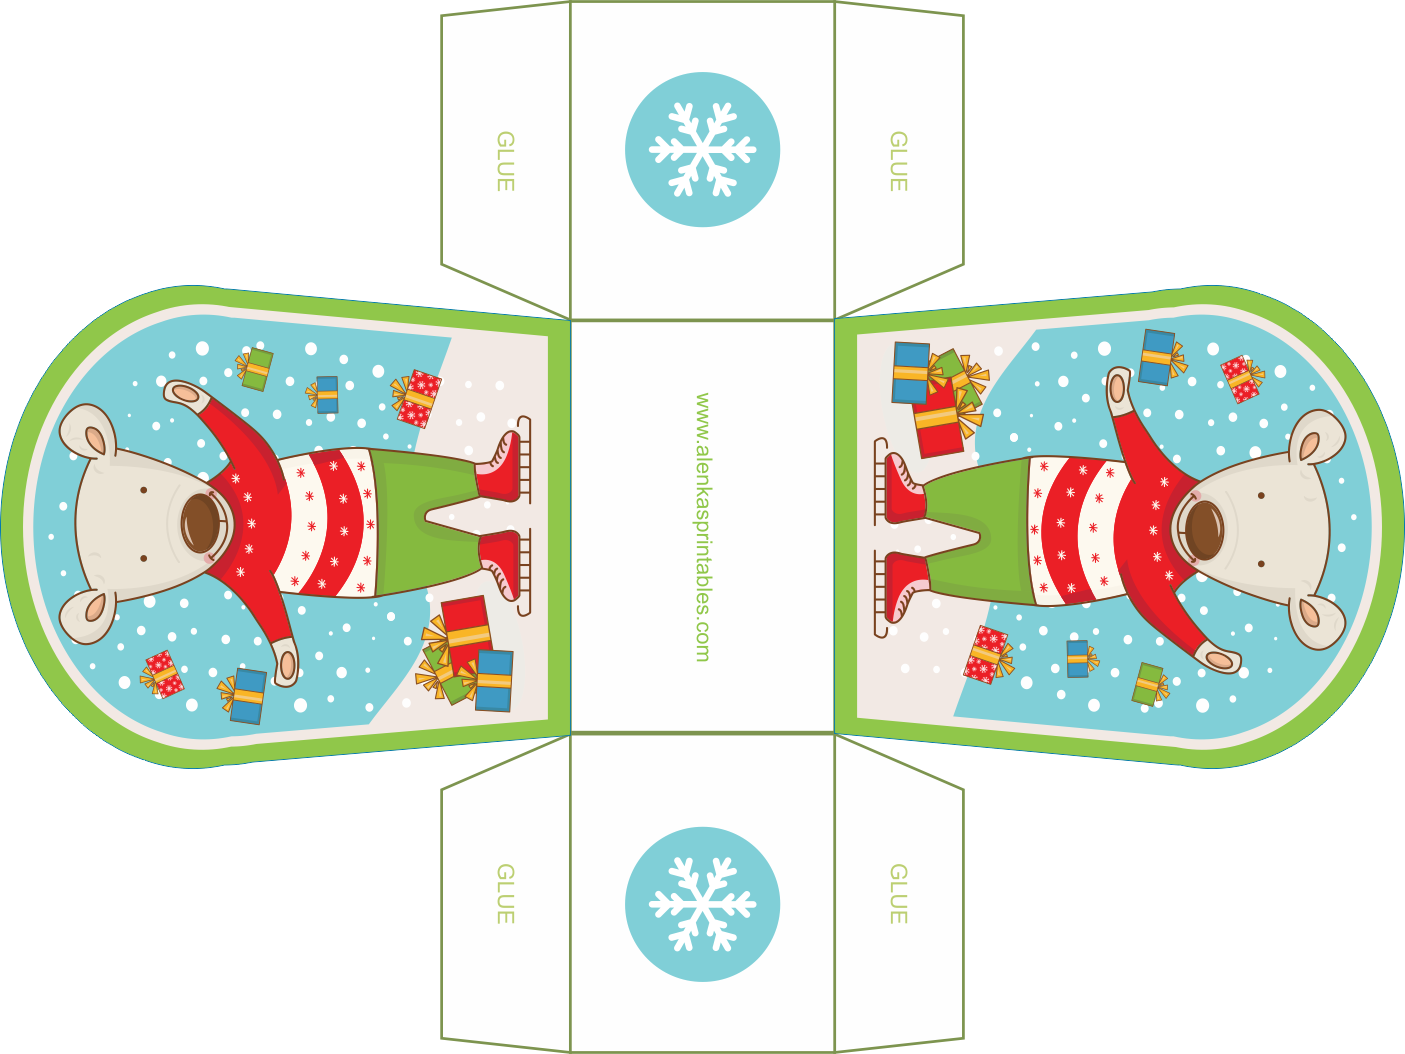 25 Days Of Christmas By Alenka S Printalbes Gift Box Template Christmas Treats Boxes Treat Box Template